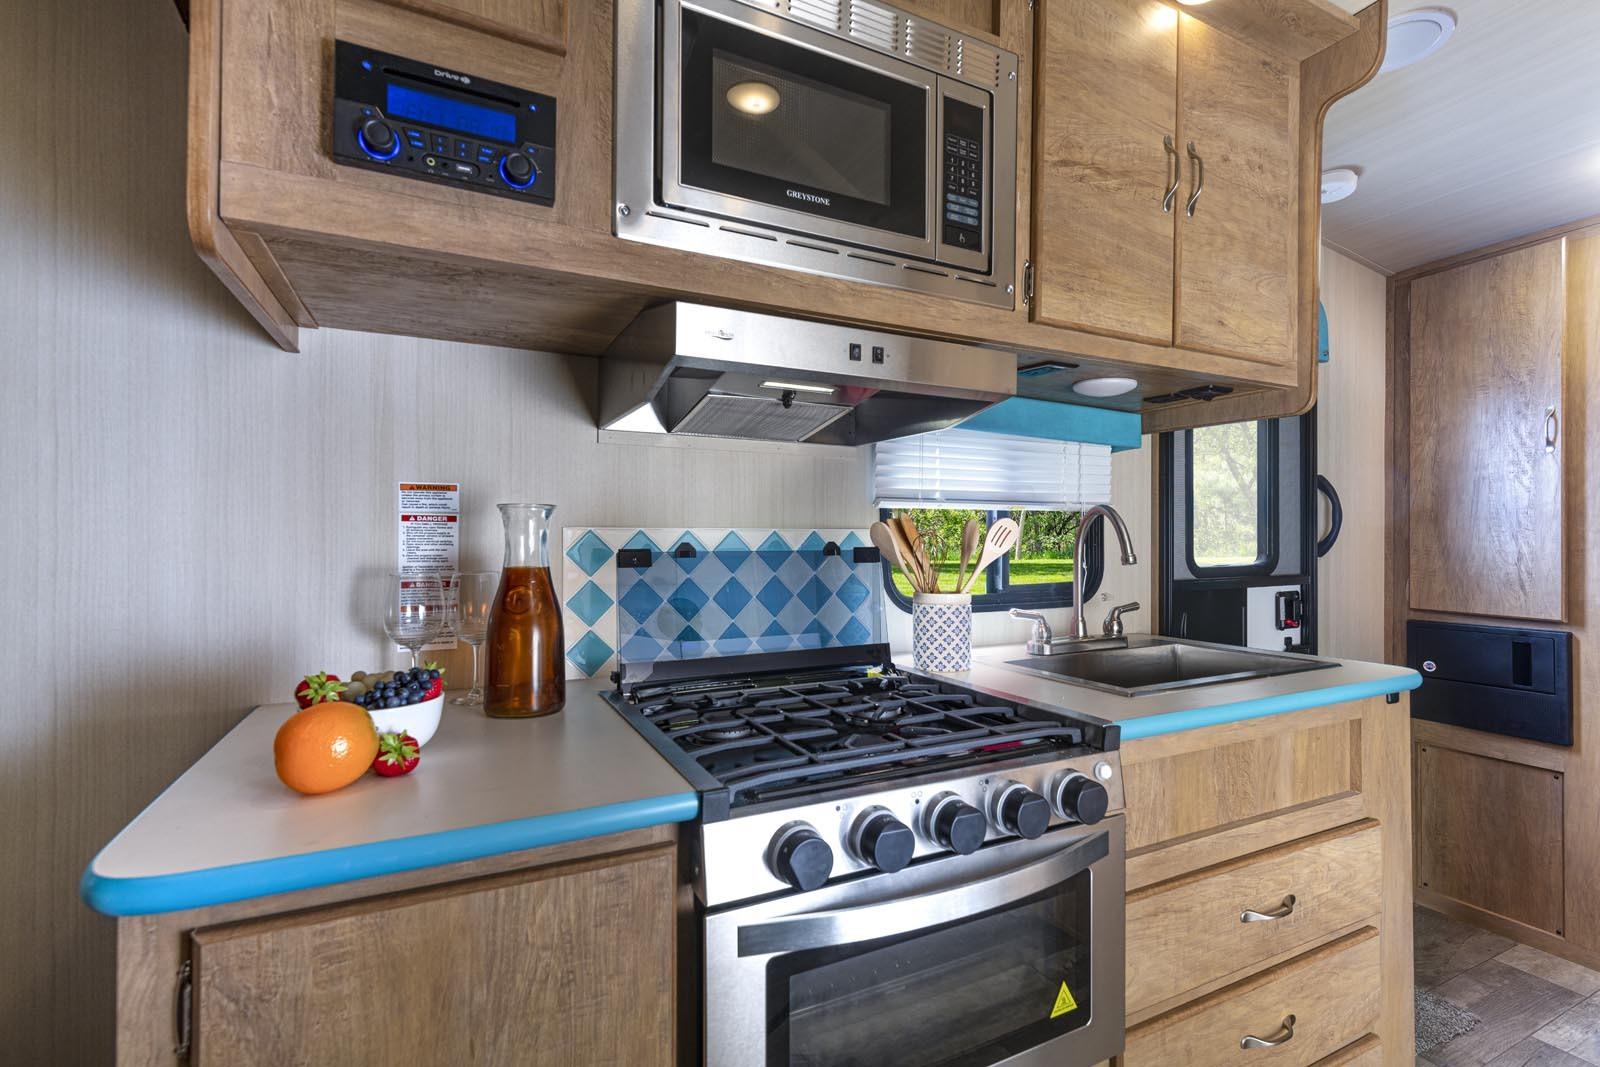 21 19csk turq kitchen